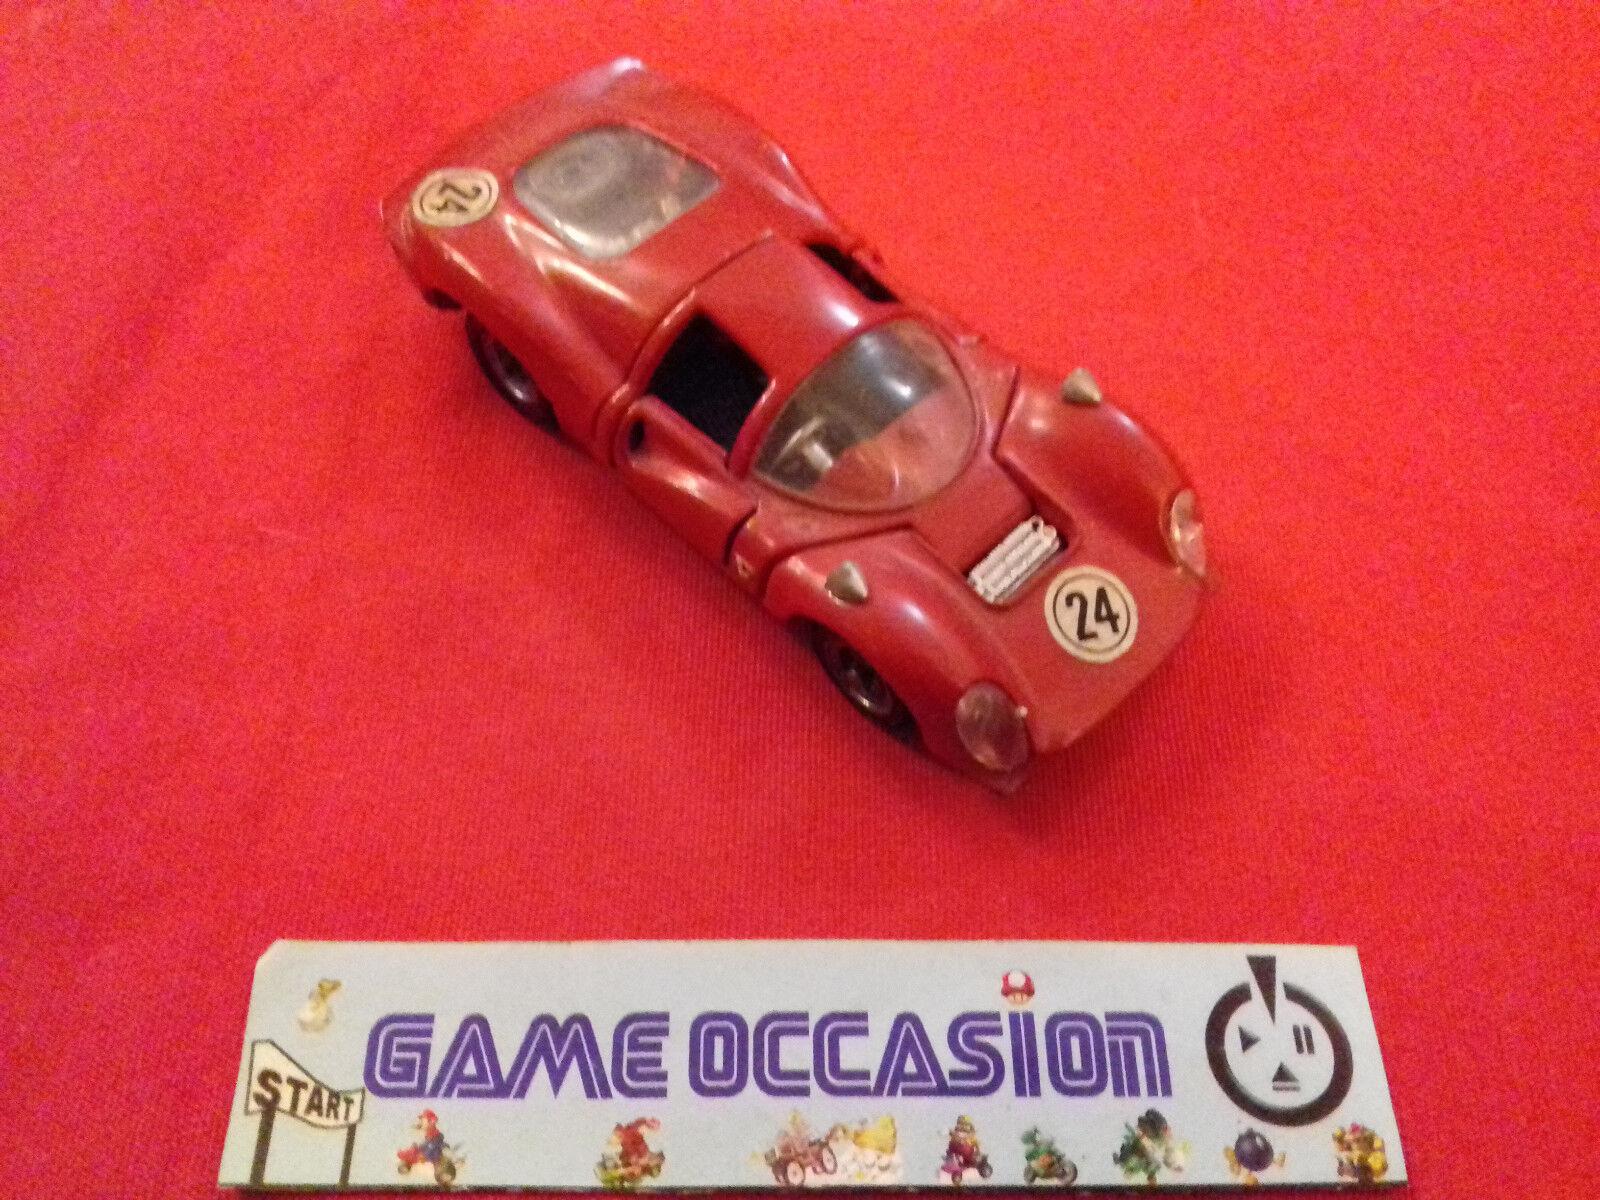 Mebetoys ferrari p.4 a-27 red  metal car 1 43